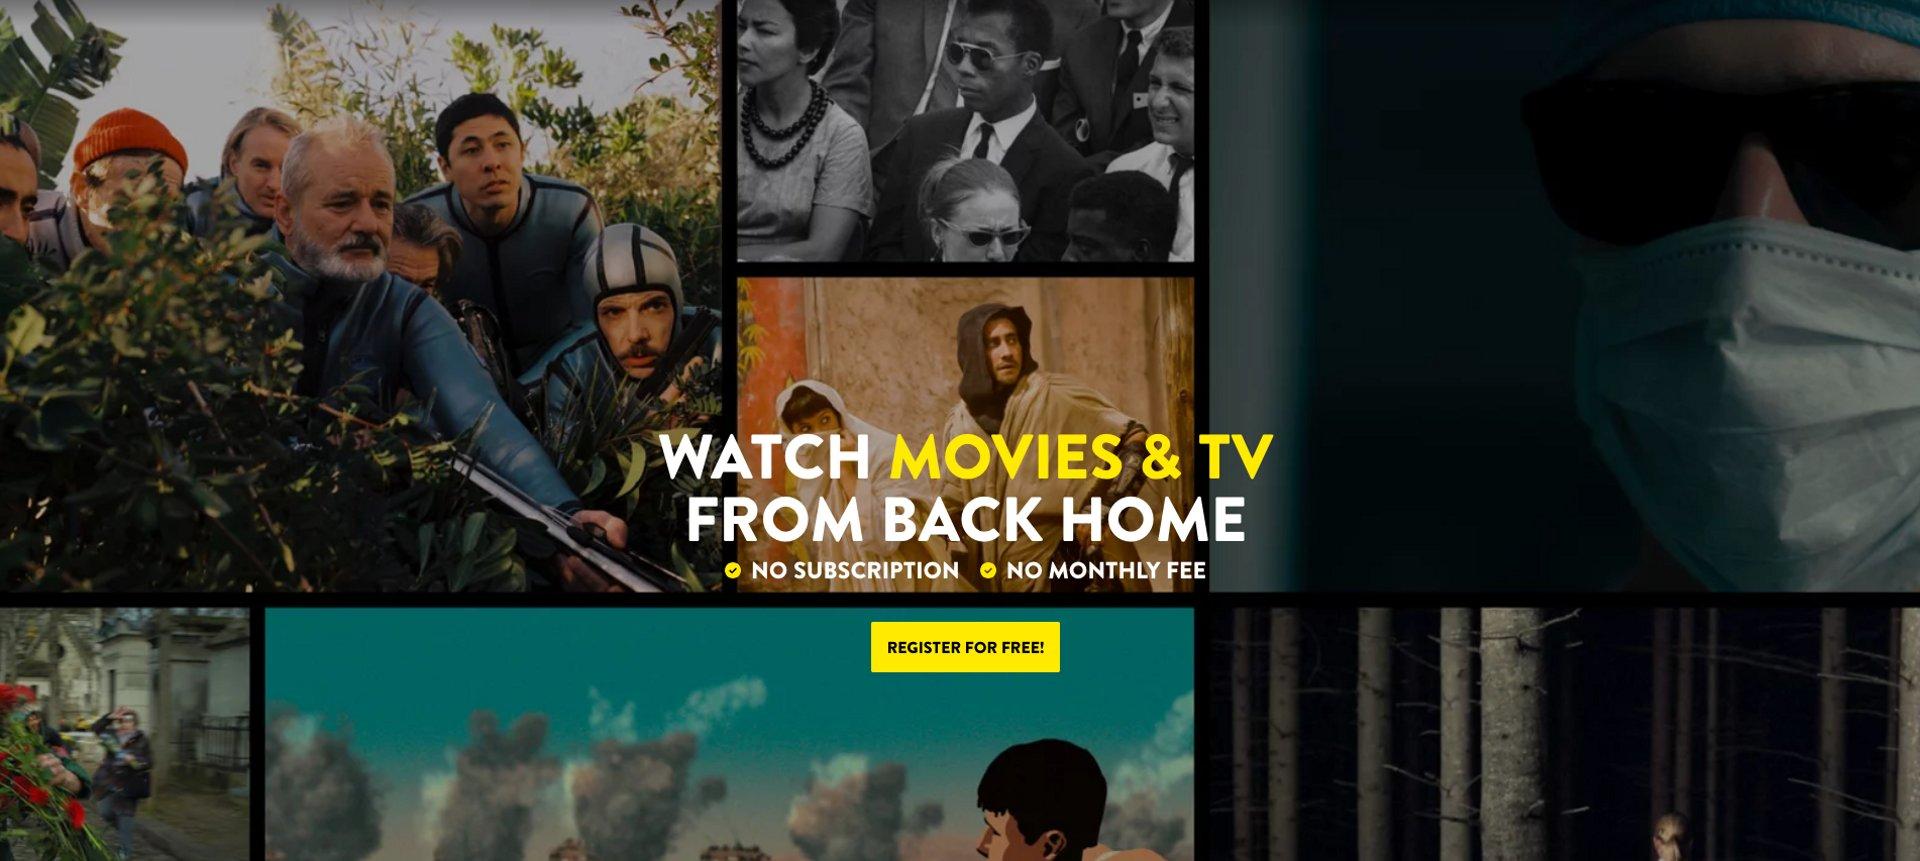 Kostenlos Filme bei Pantaflix streamen